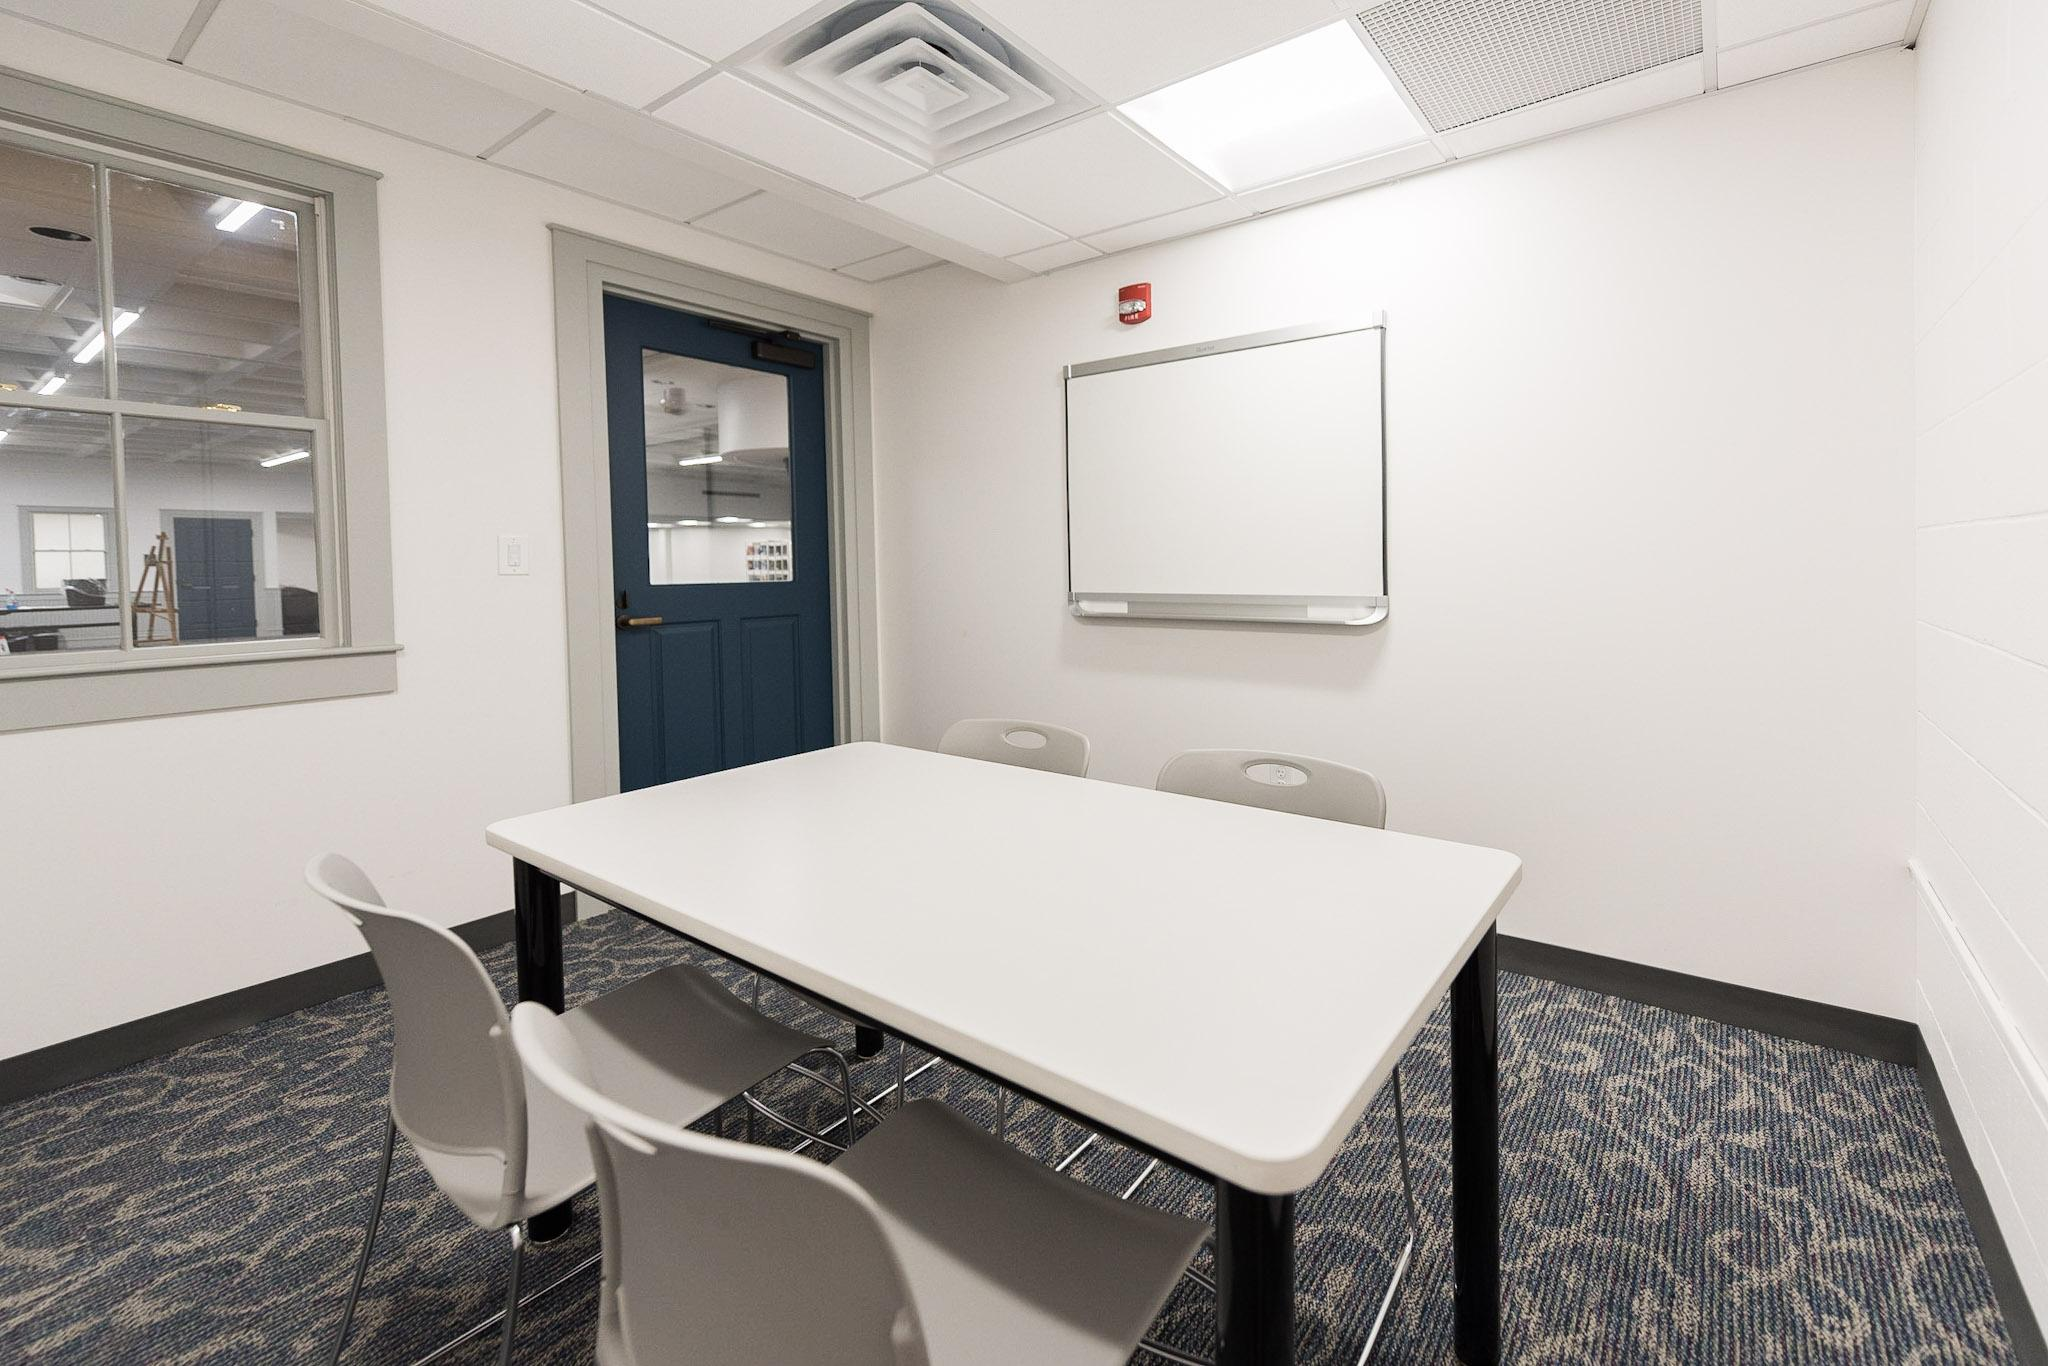 Fall Ceiling Wallpaper Design Small Meeting Room Nashua Public Library